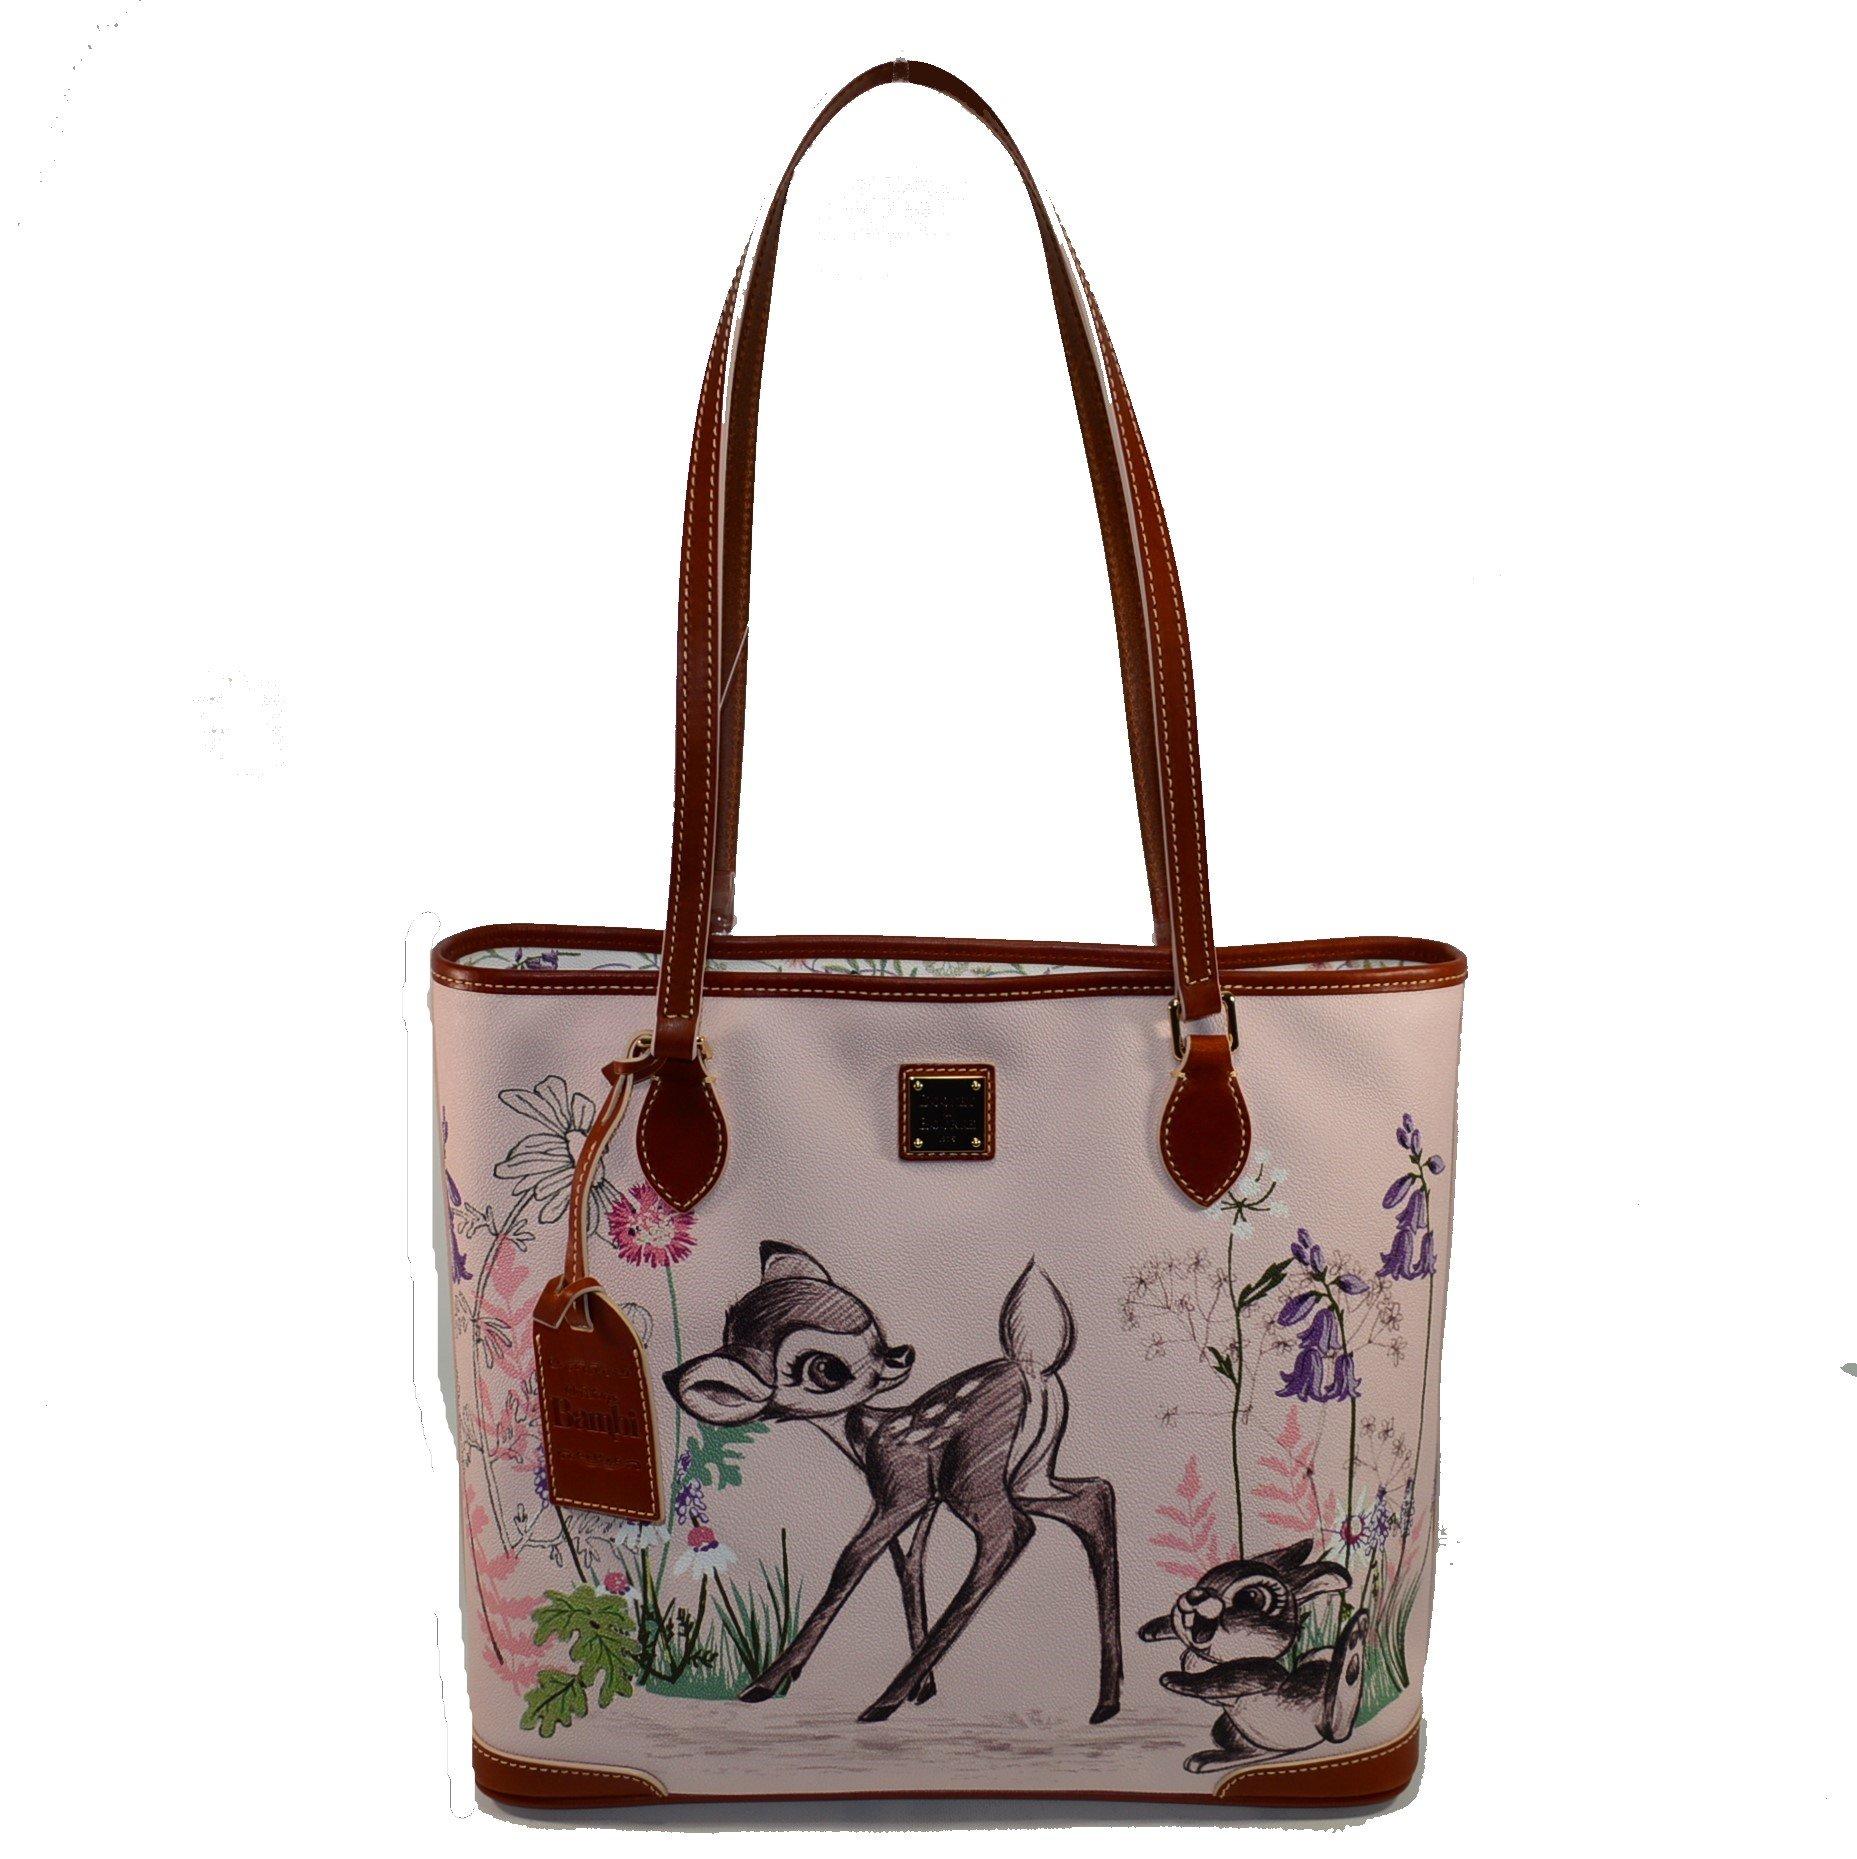 Disney Dooney and Bourke Bambi Shopper Tote Bag Purse